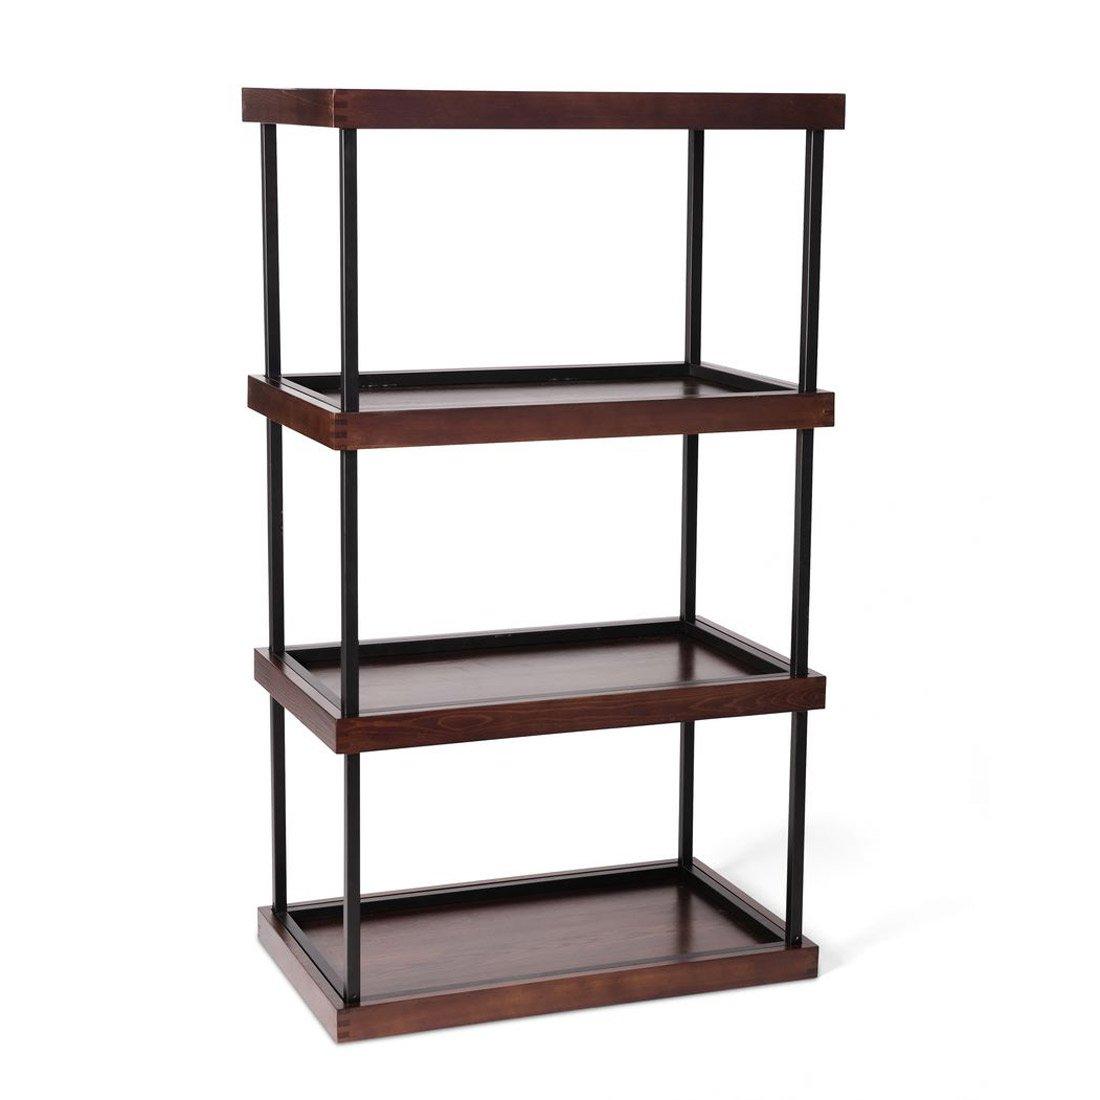 Coltura Sunshelf Stackable Wooden Shelves With Built In